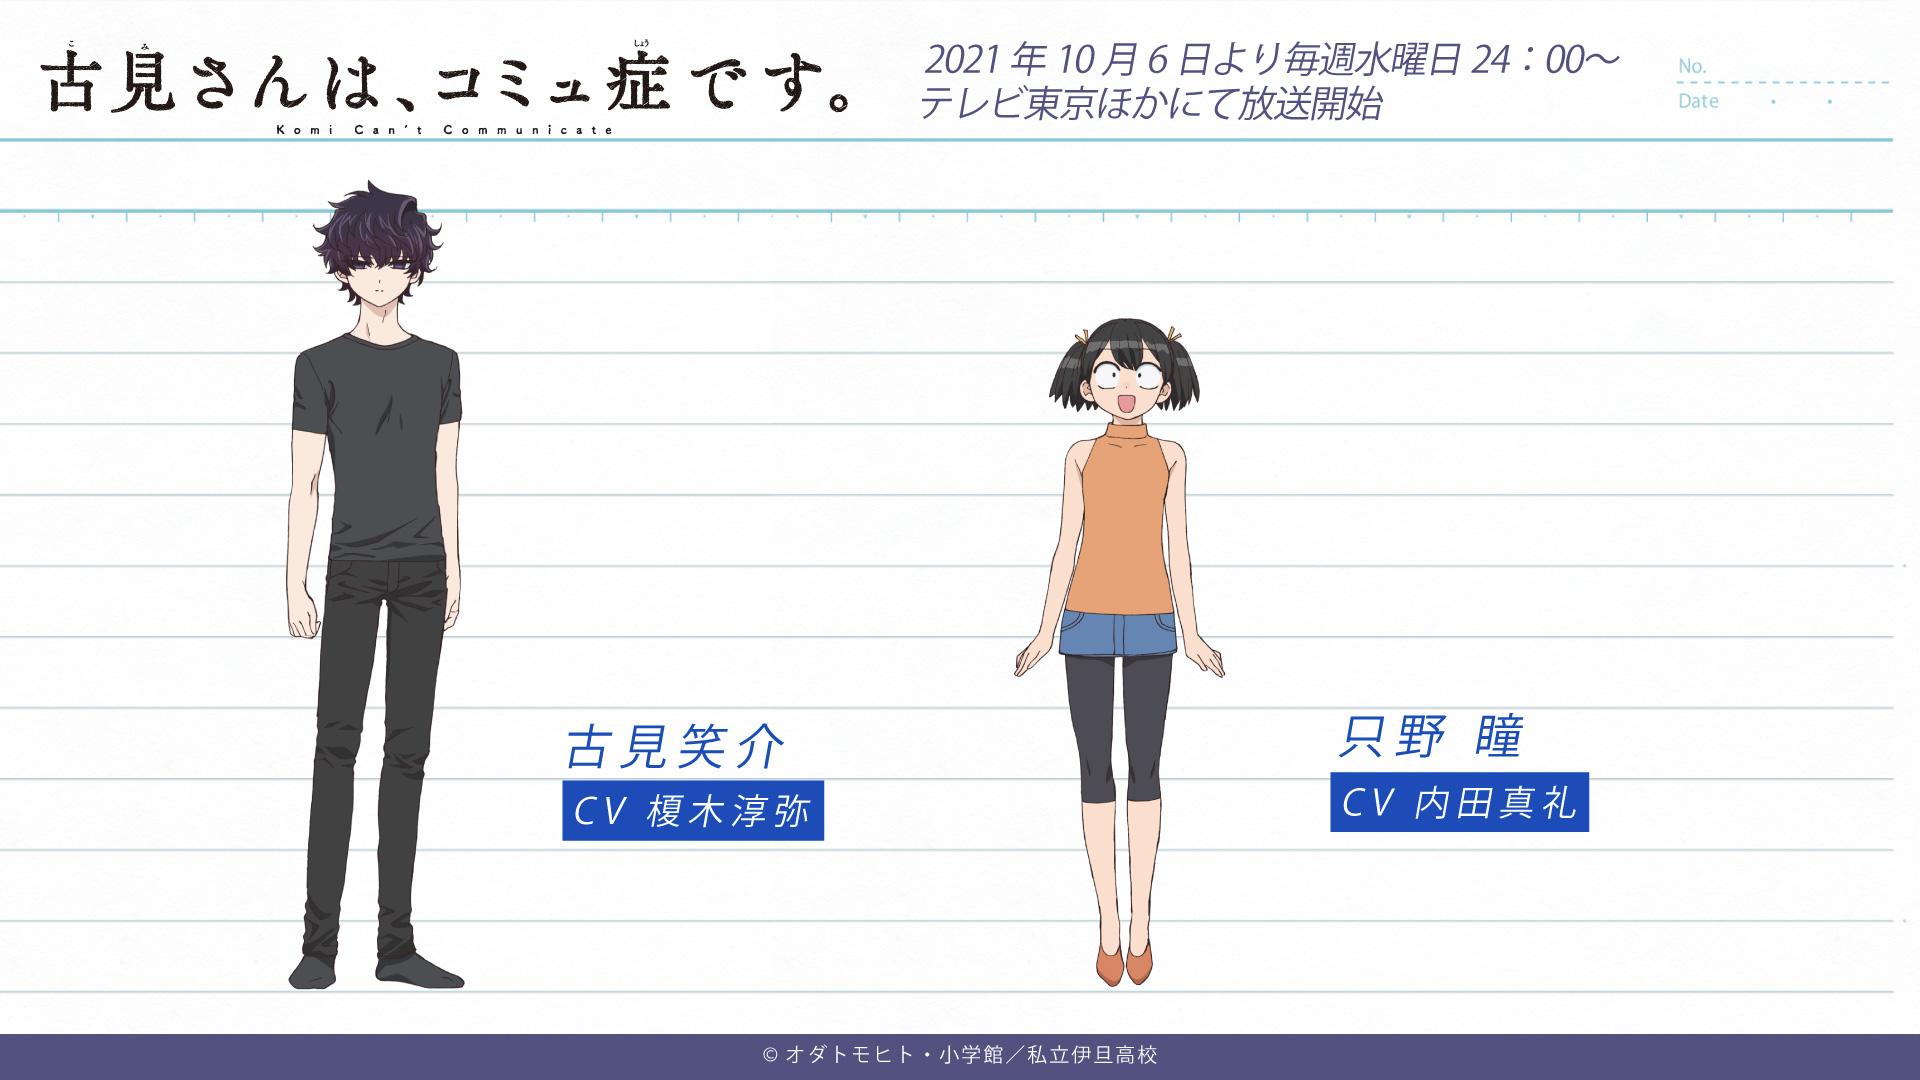 Shousuke Komi (izquierda) y Hitomi Tadano (derecha)